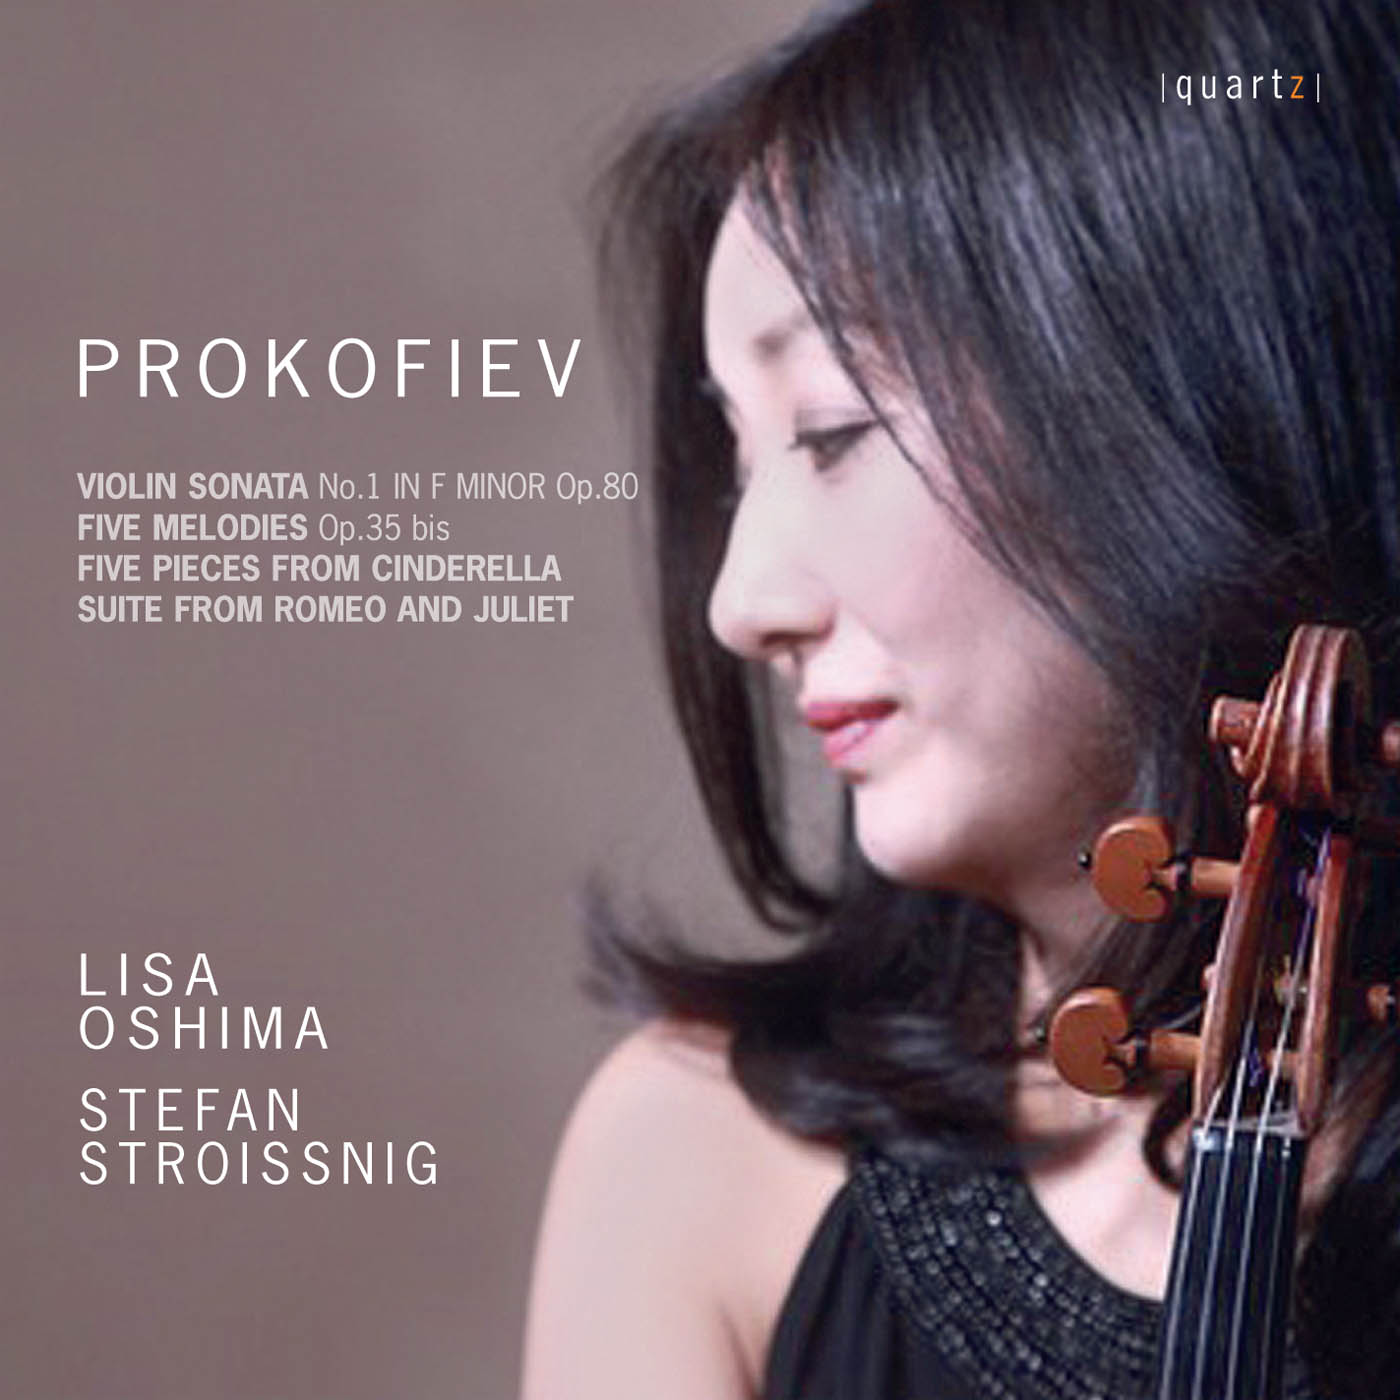 Prokofiev - Lisa Oshima, violin & Stefan Stroissnig, piano